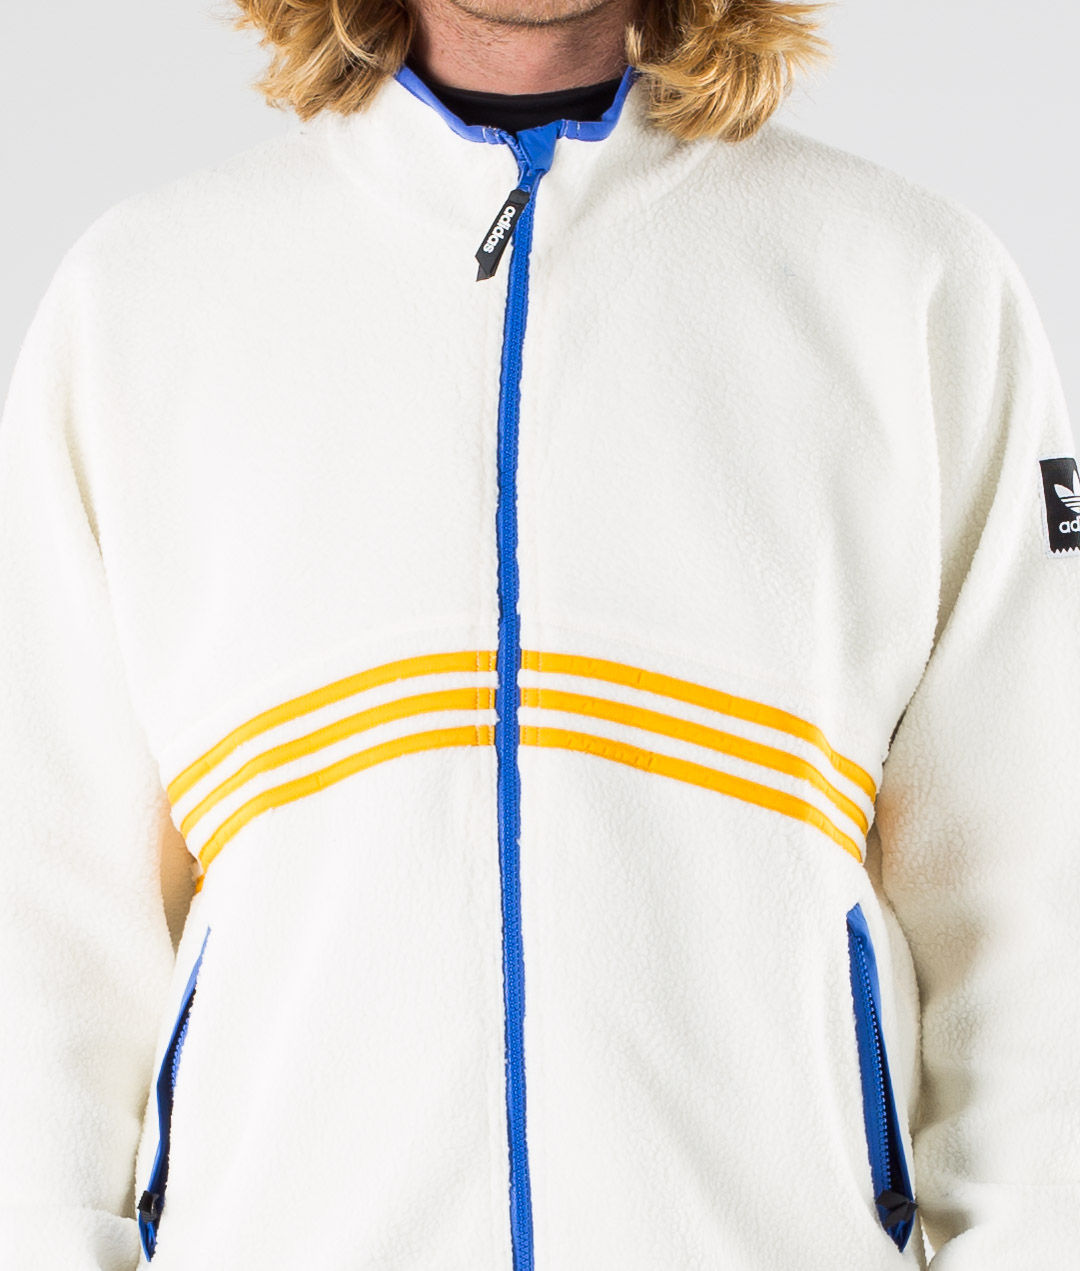 Adidas Skateboarding Sherpa Full Zip Giacca Cream WhiteCollegiate OrangeHi Res Blue S18Carbon